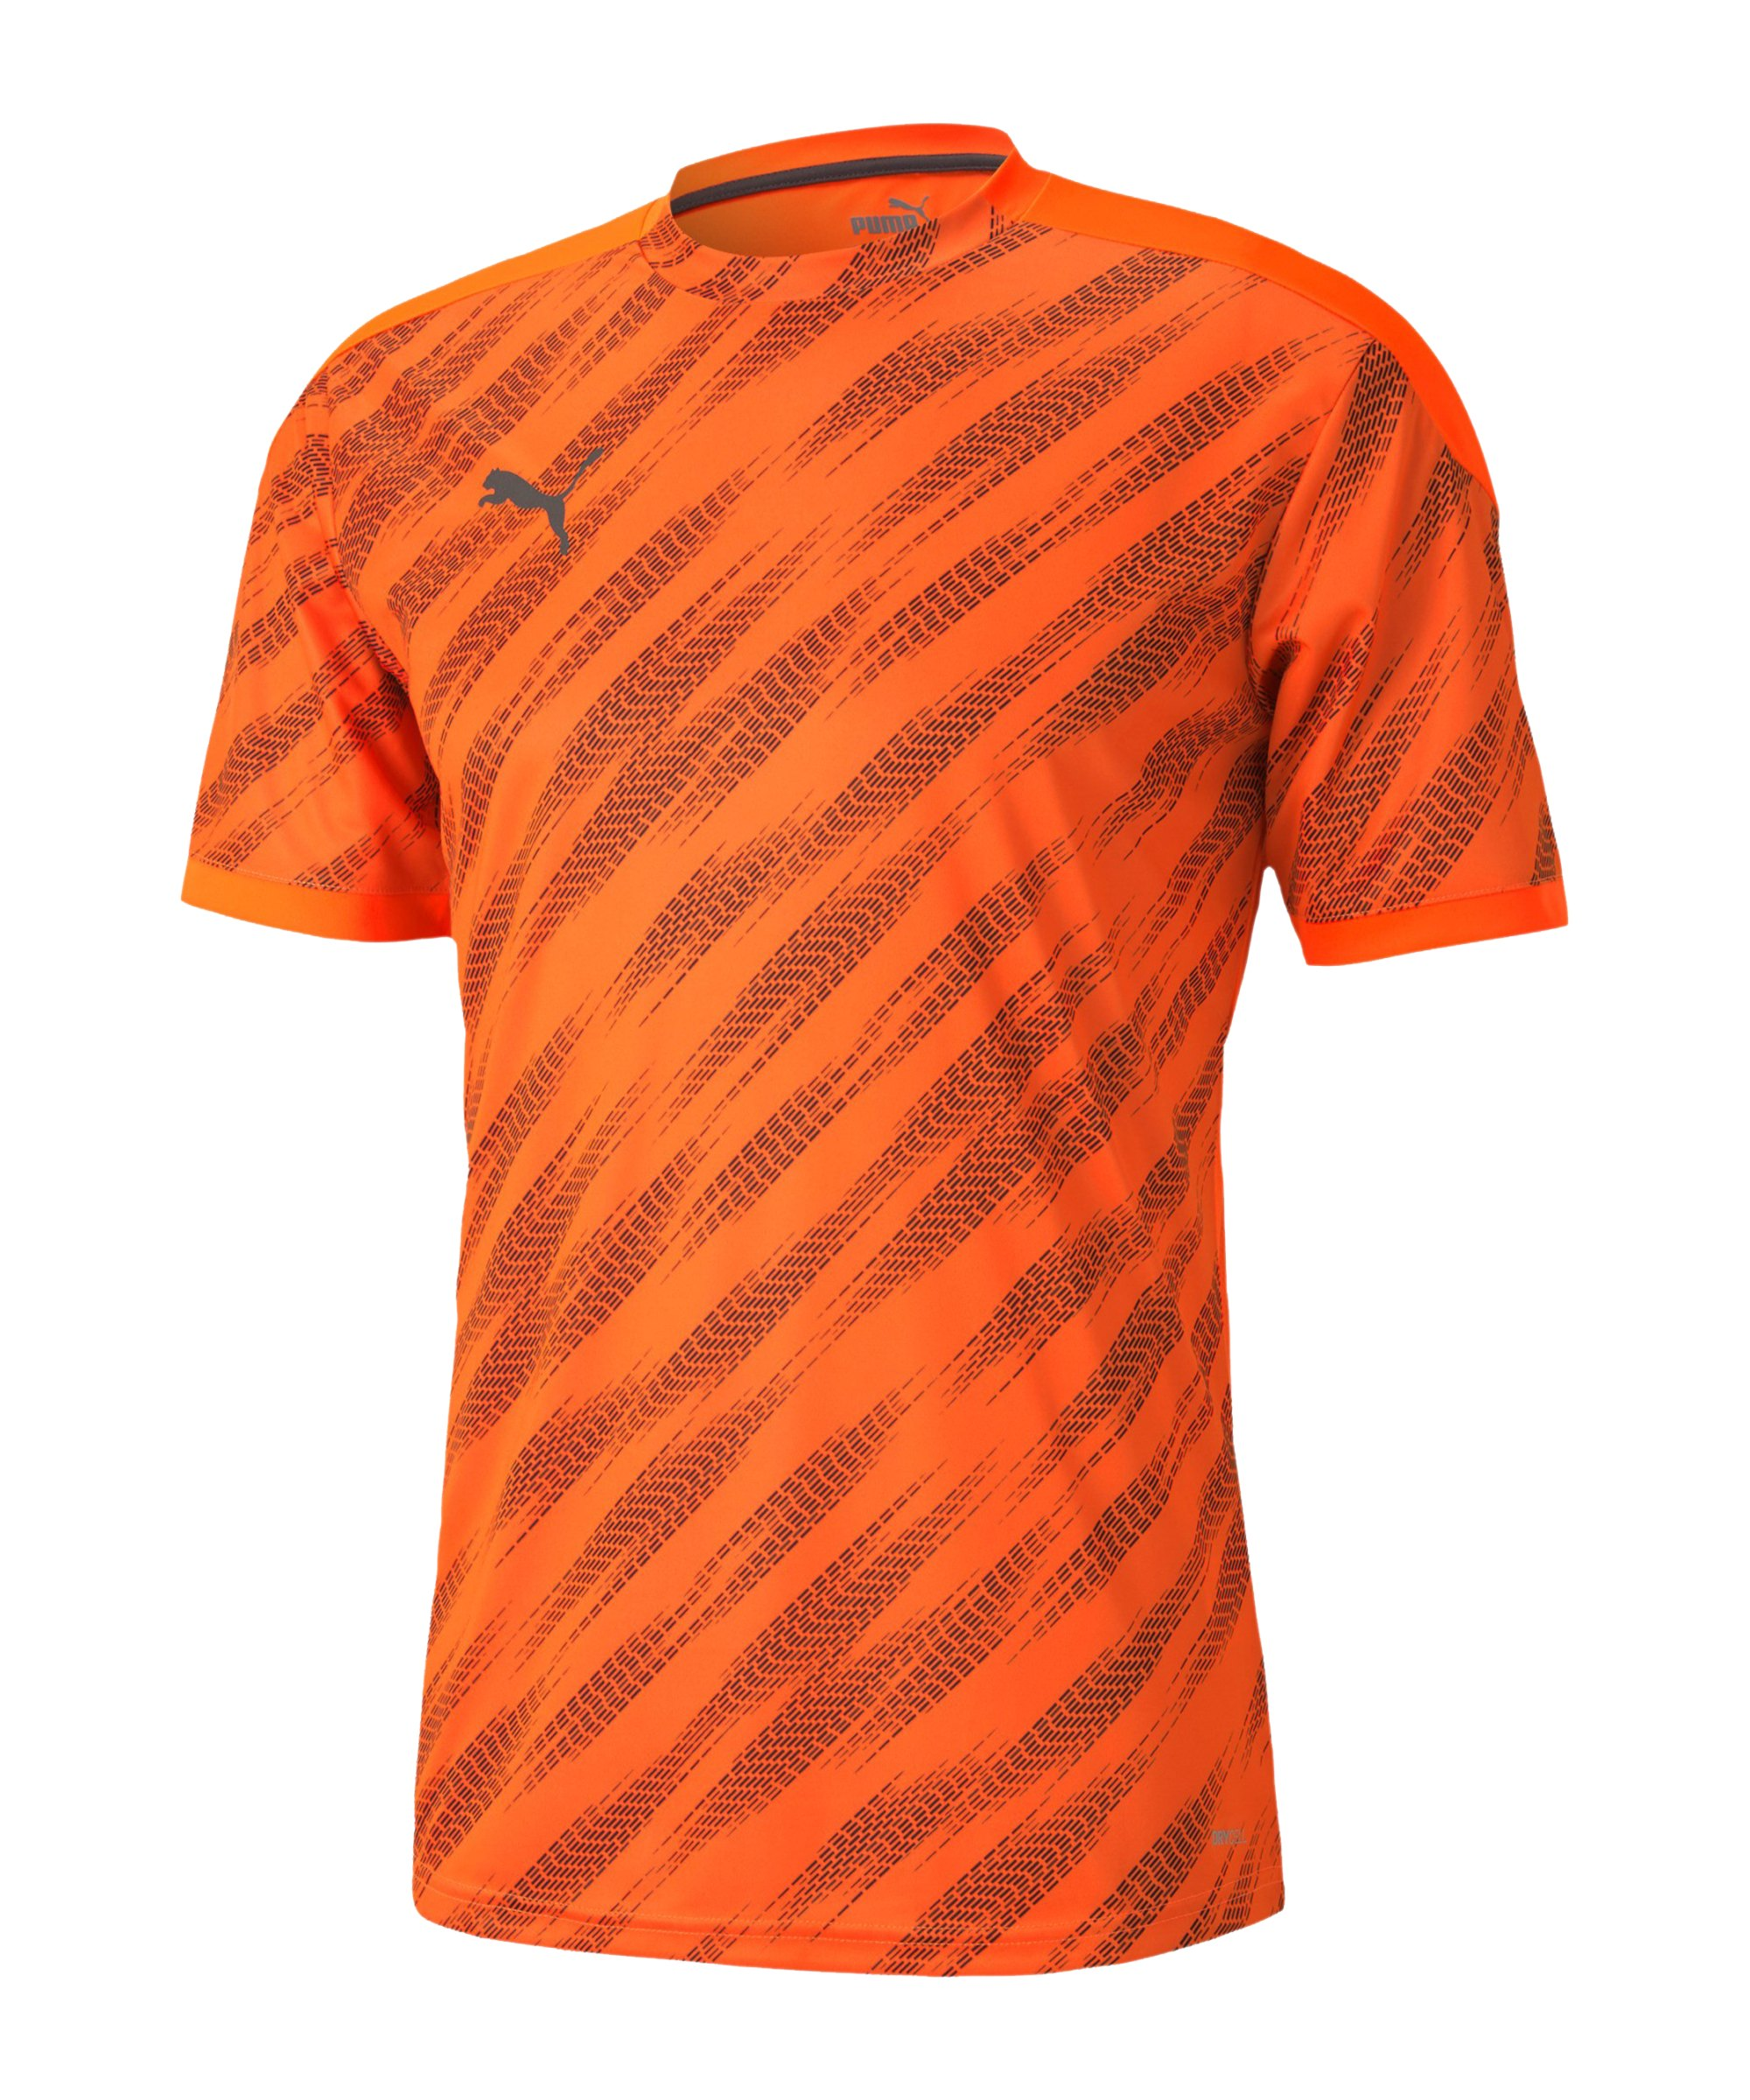 PUMA ftblNXT Graphic T-Shirt Orange F02 - orange